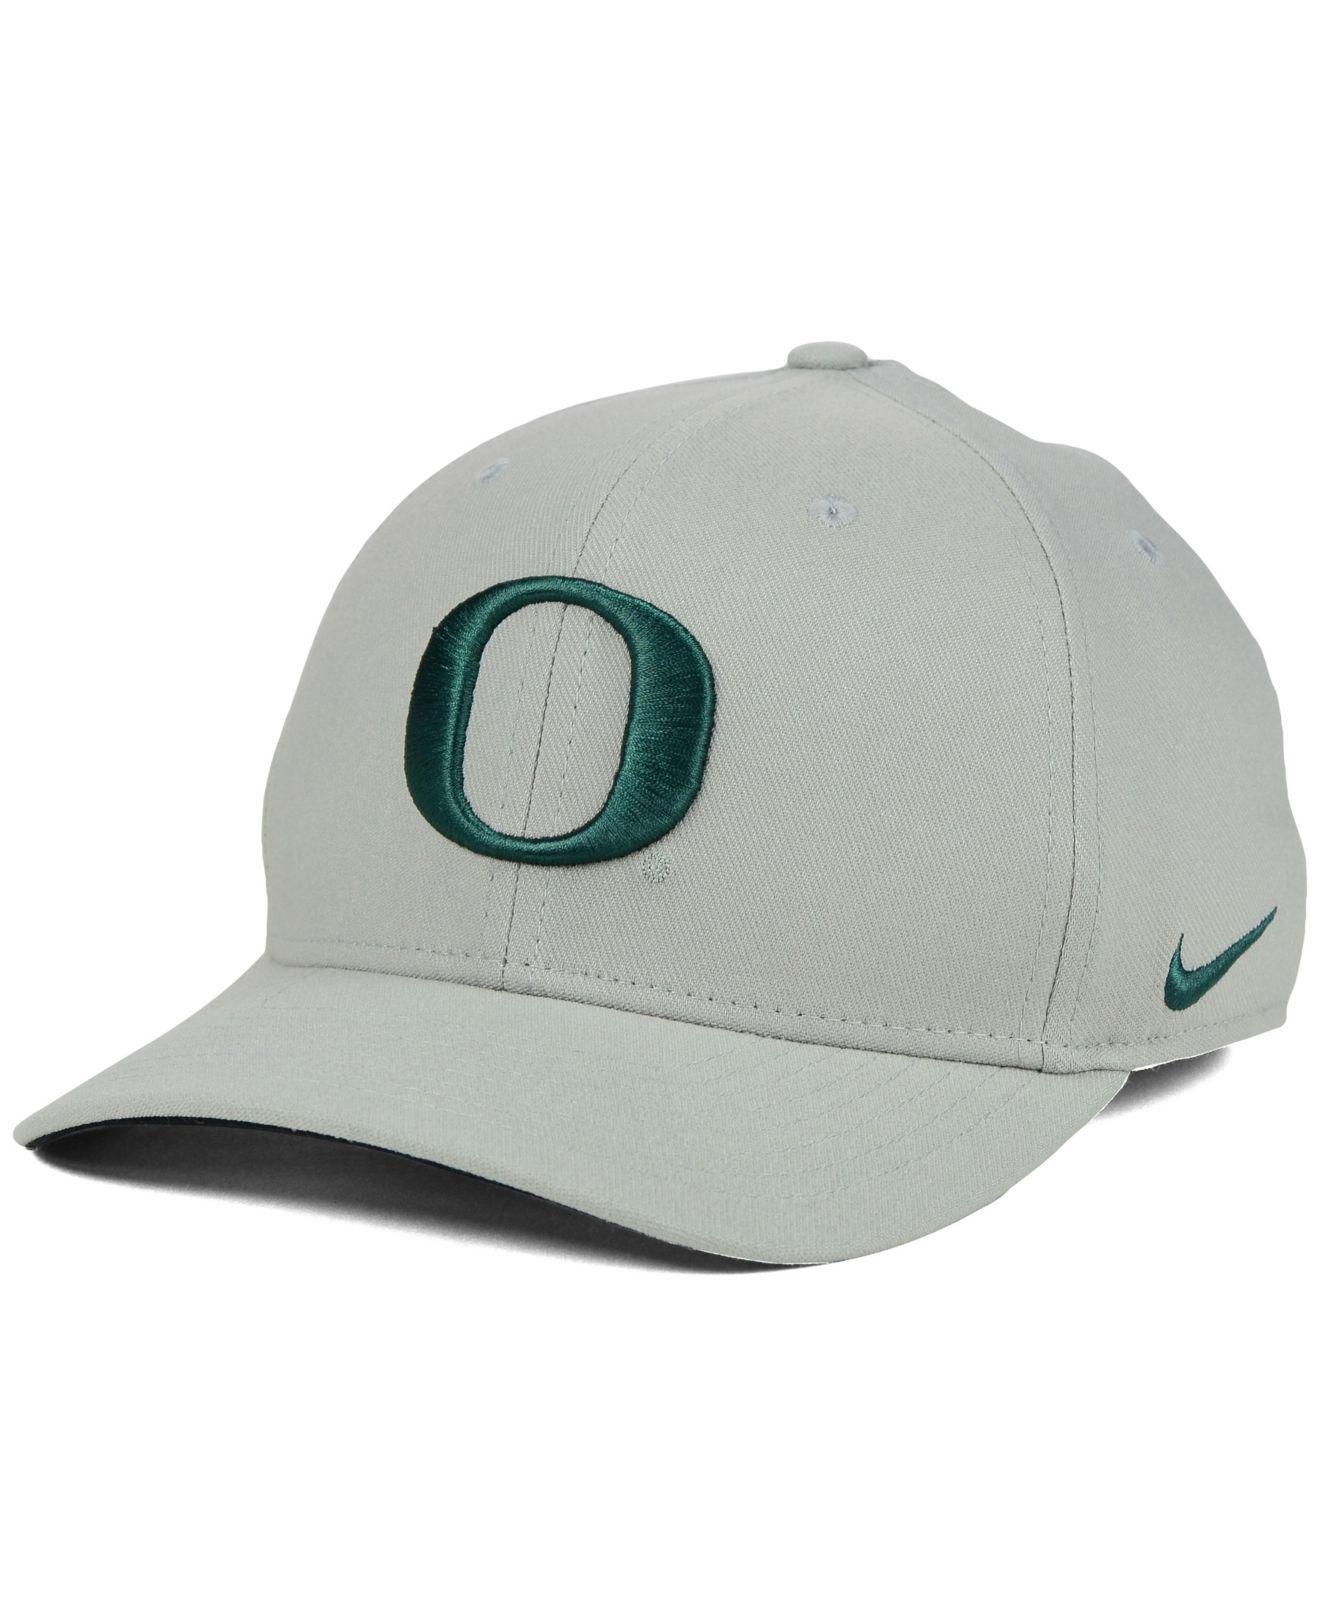 b95b3691 purchase lyst nike oregon ducks classic swoosh cap in gray for men 29cef  a4494